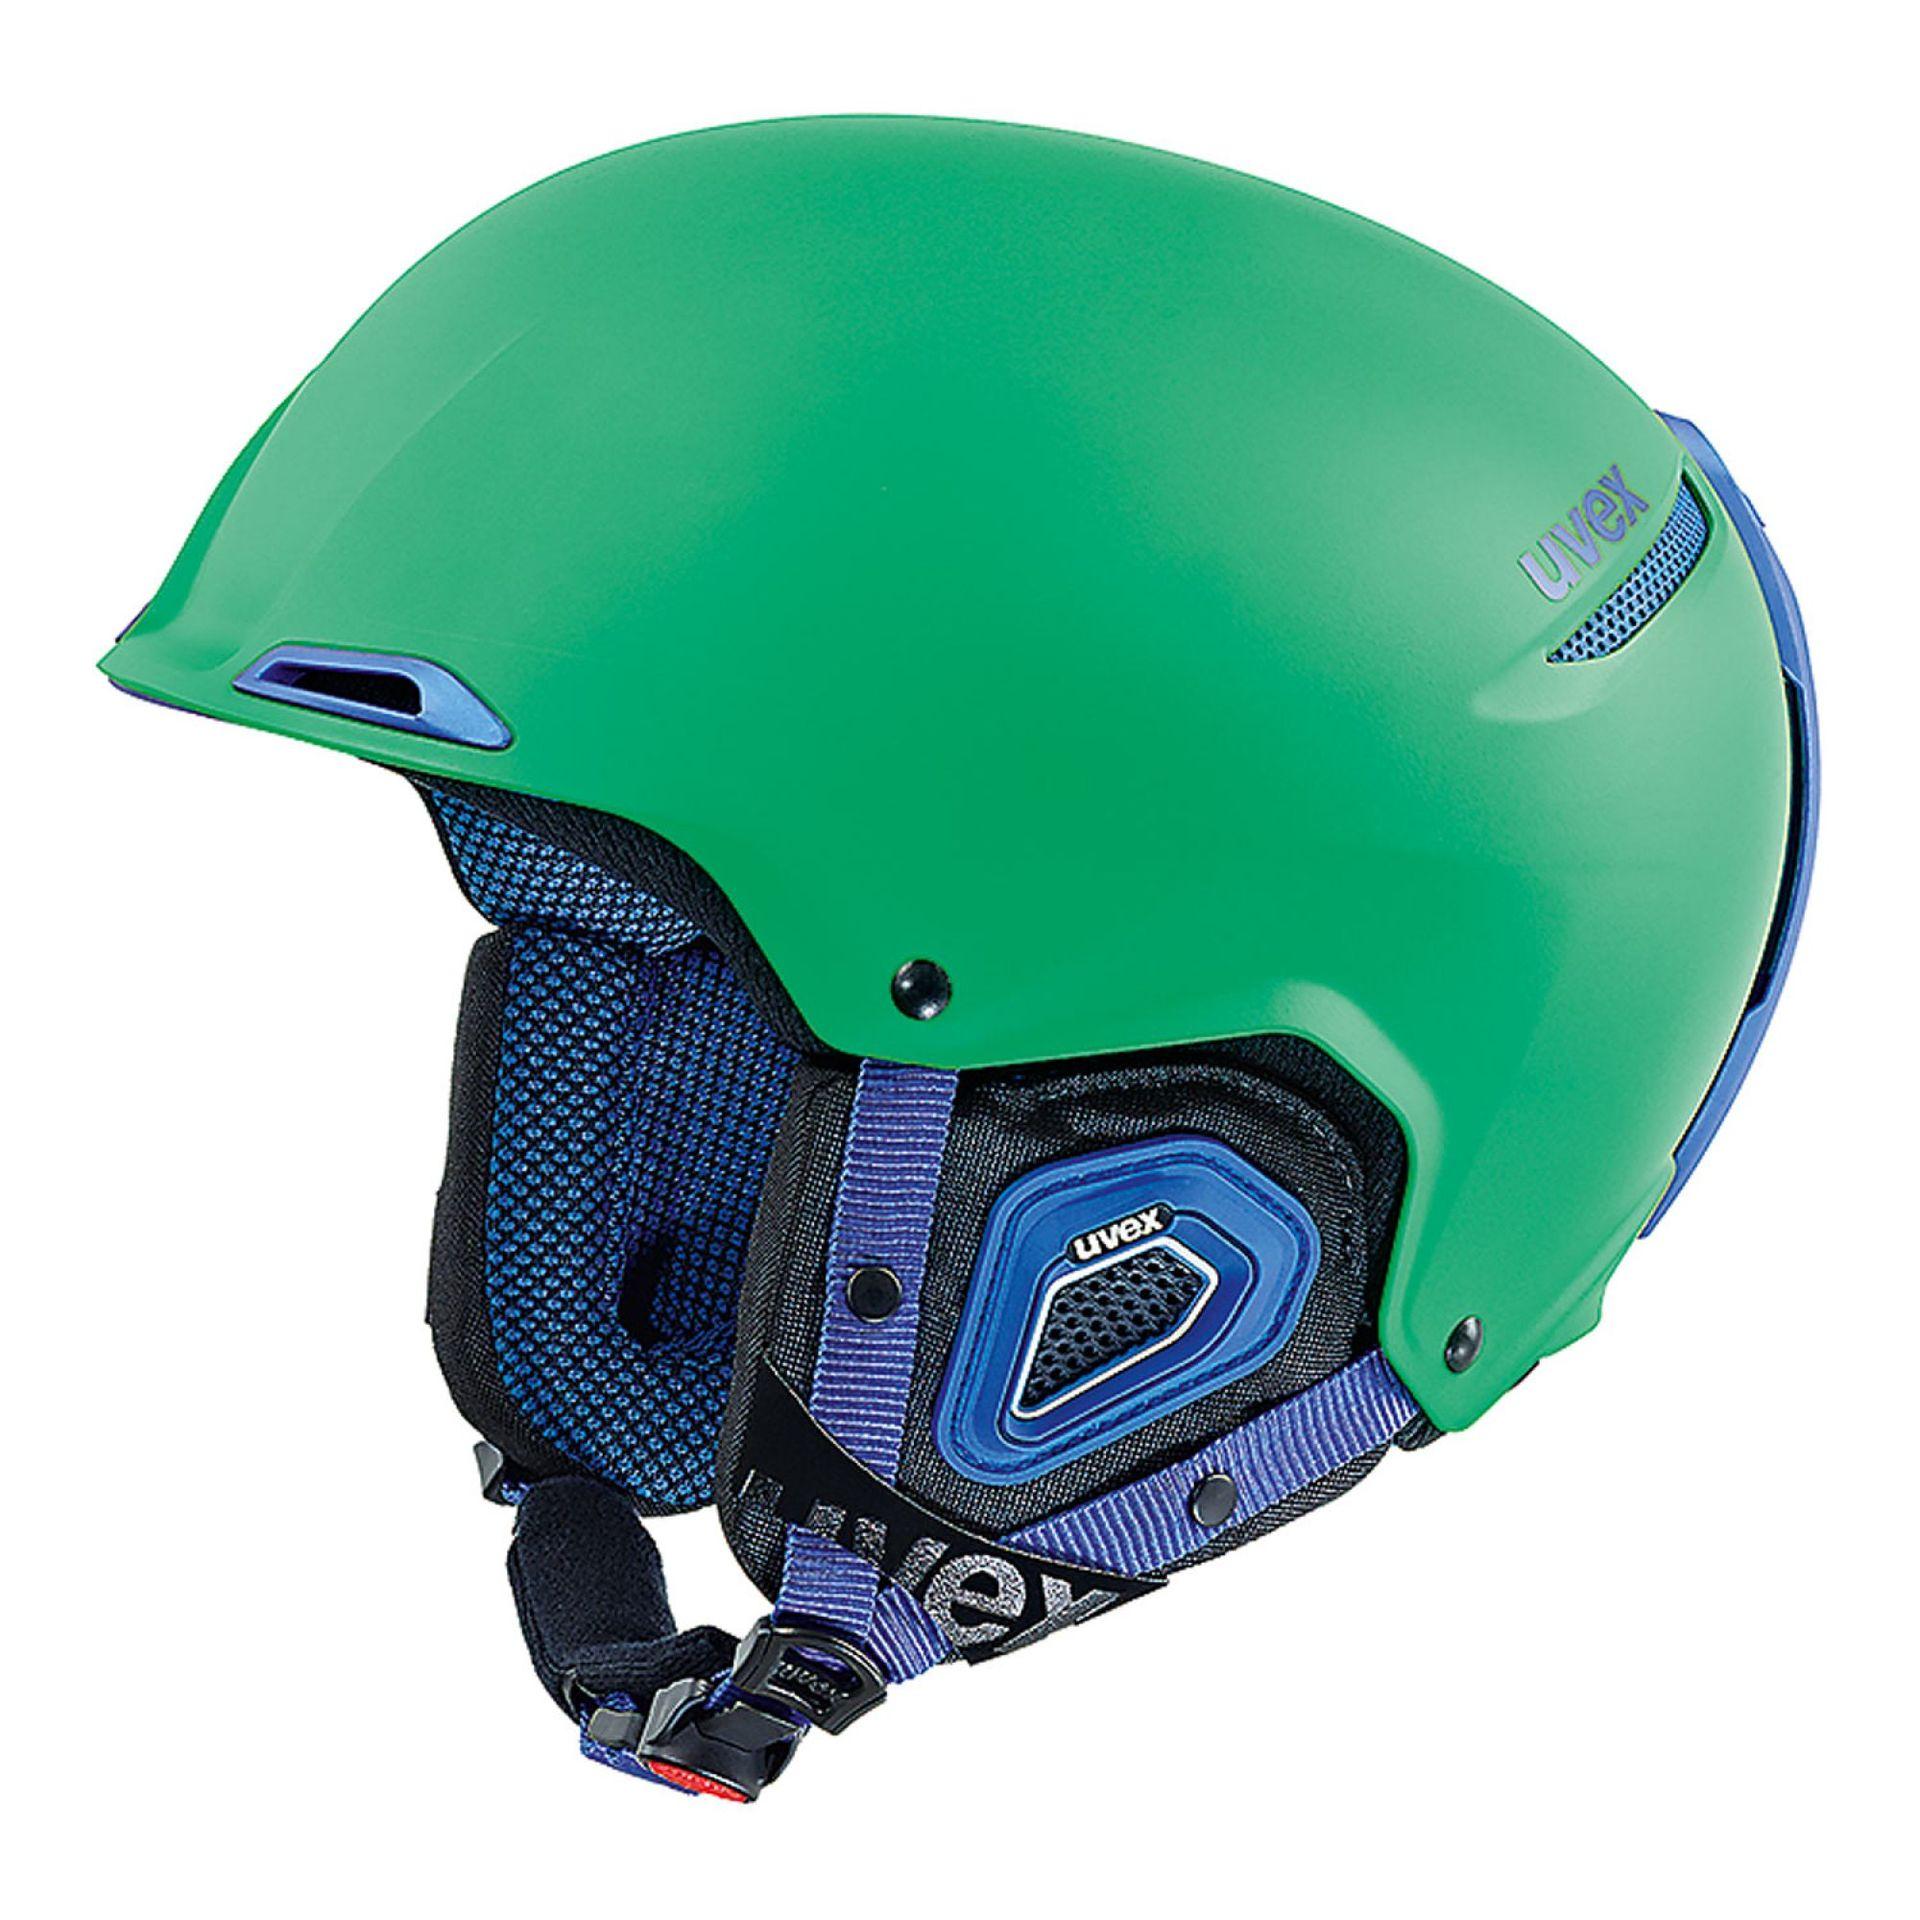 KASK UVEX JAKK+ GREEN BLUE MAT